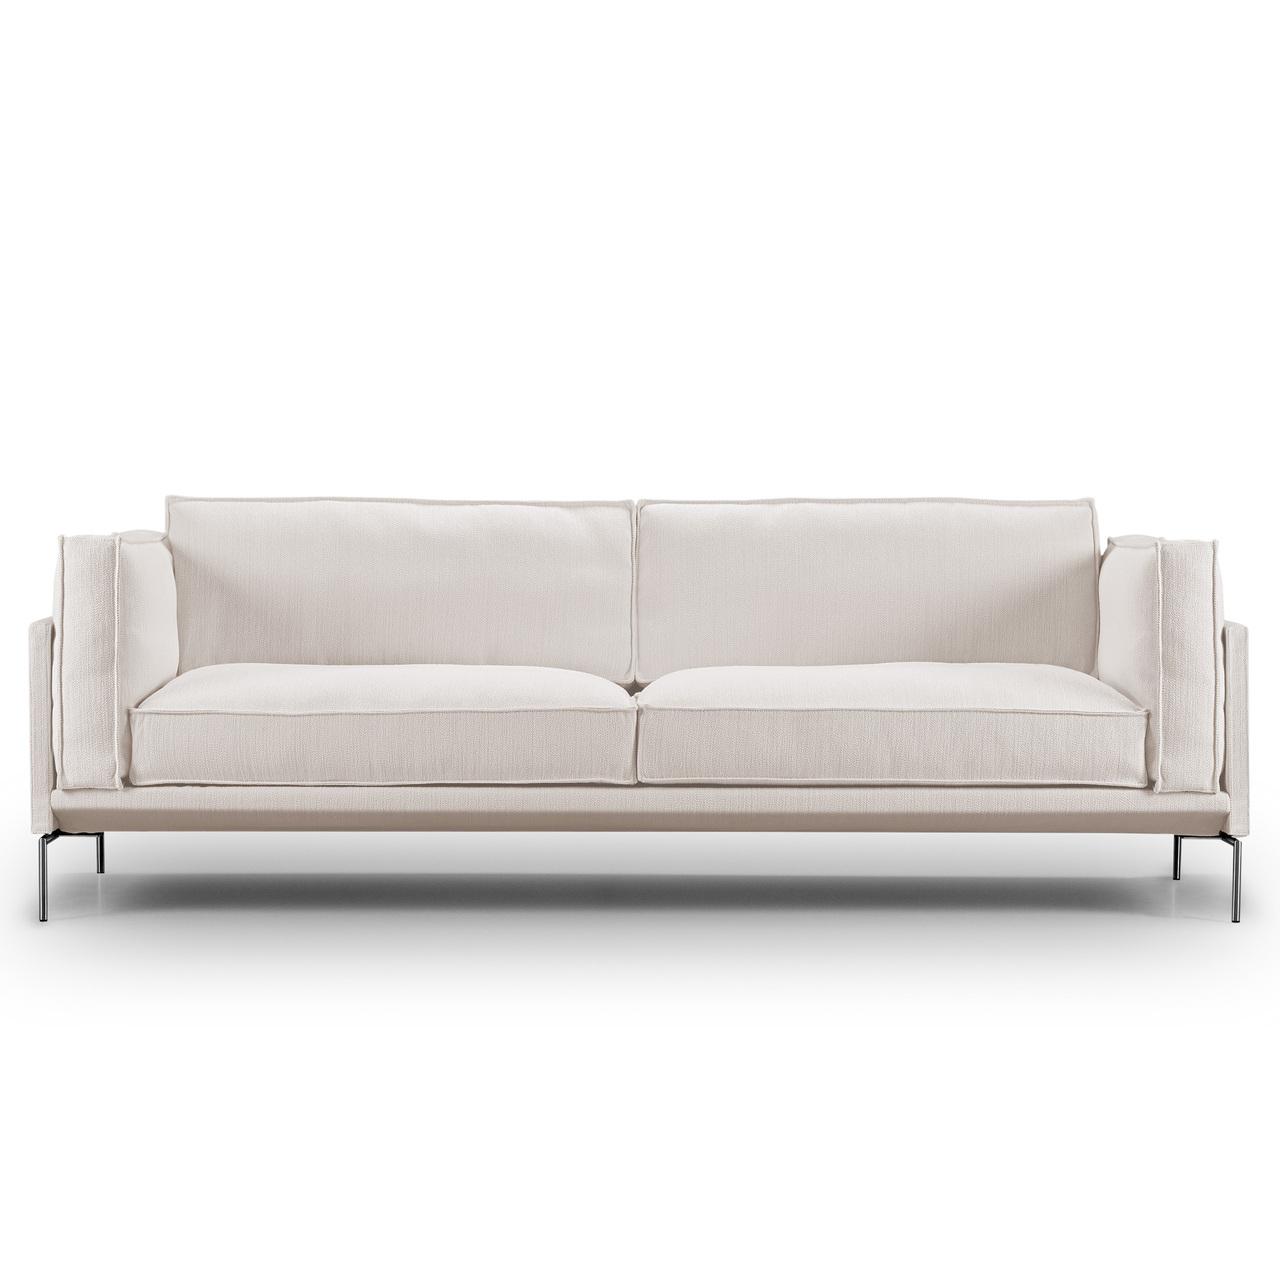 Eilersen Sofa 'Slimline' Hellgrau 20 - Gravel, B: 240 cm, Gebürsteter Edelstahl